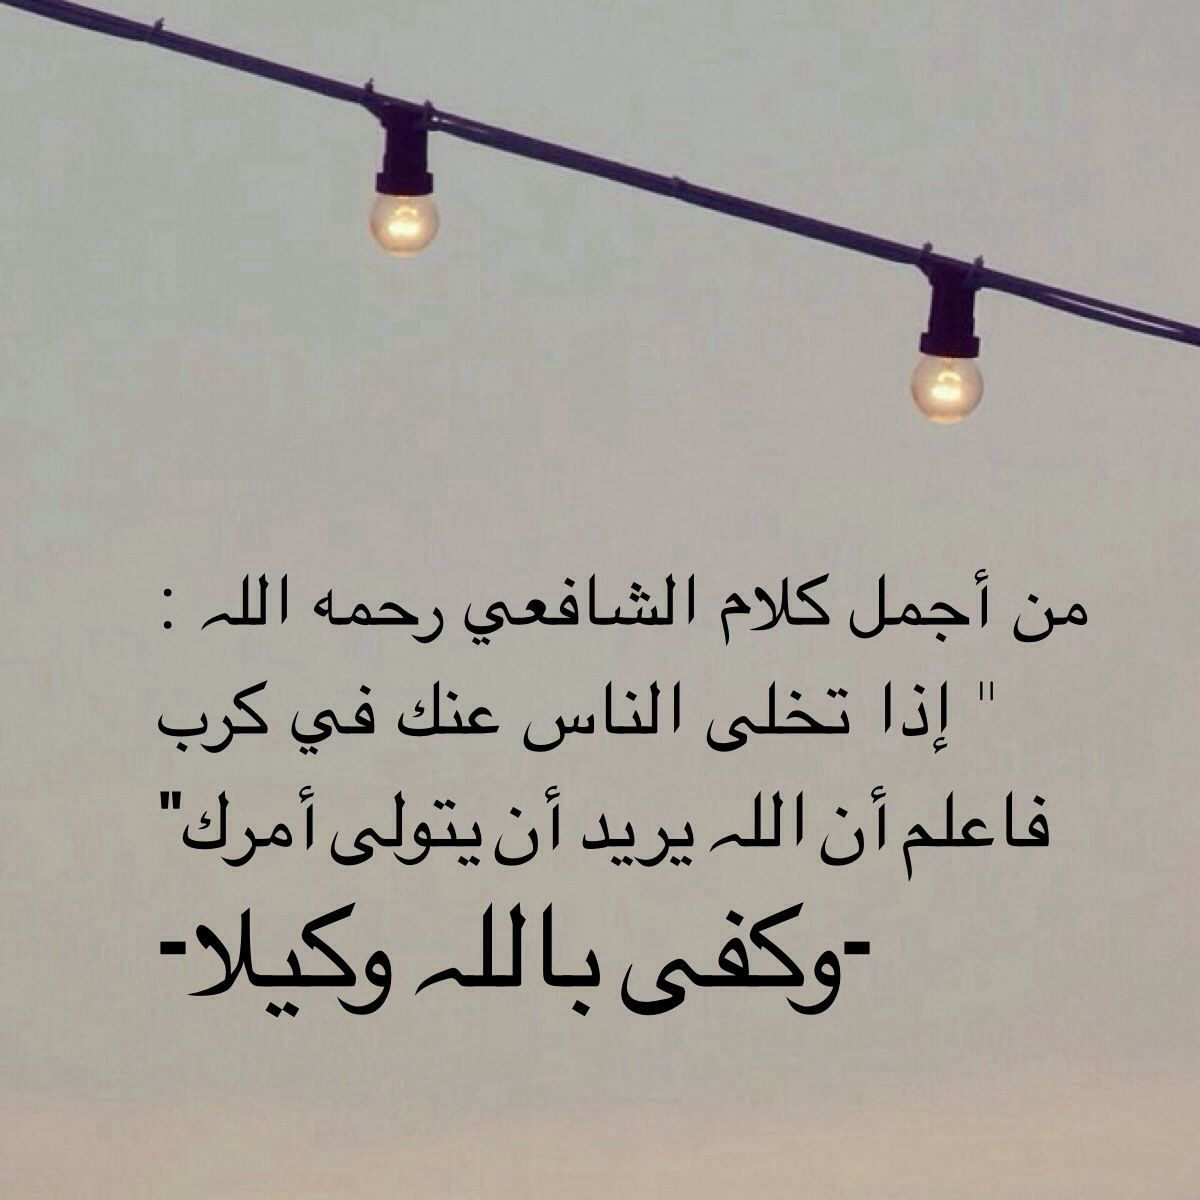 Pin By Hadil Abdelatty On Muslim Islam Facts Islamic Phrases Illustration Quotes